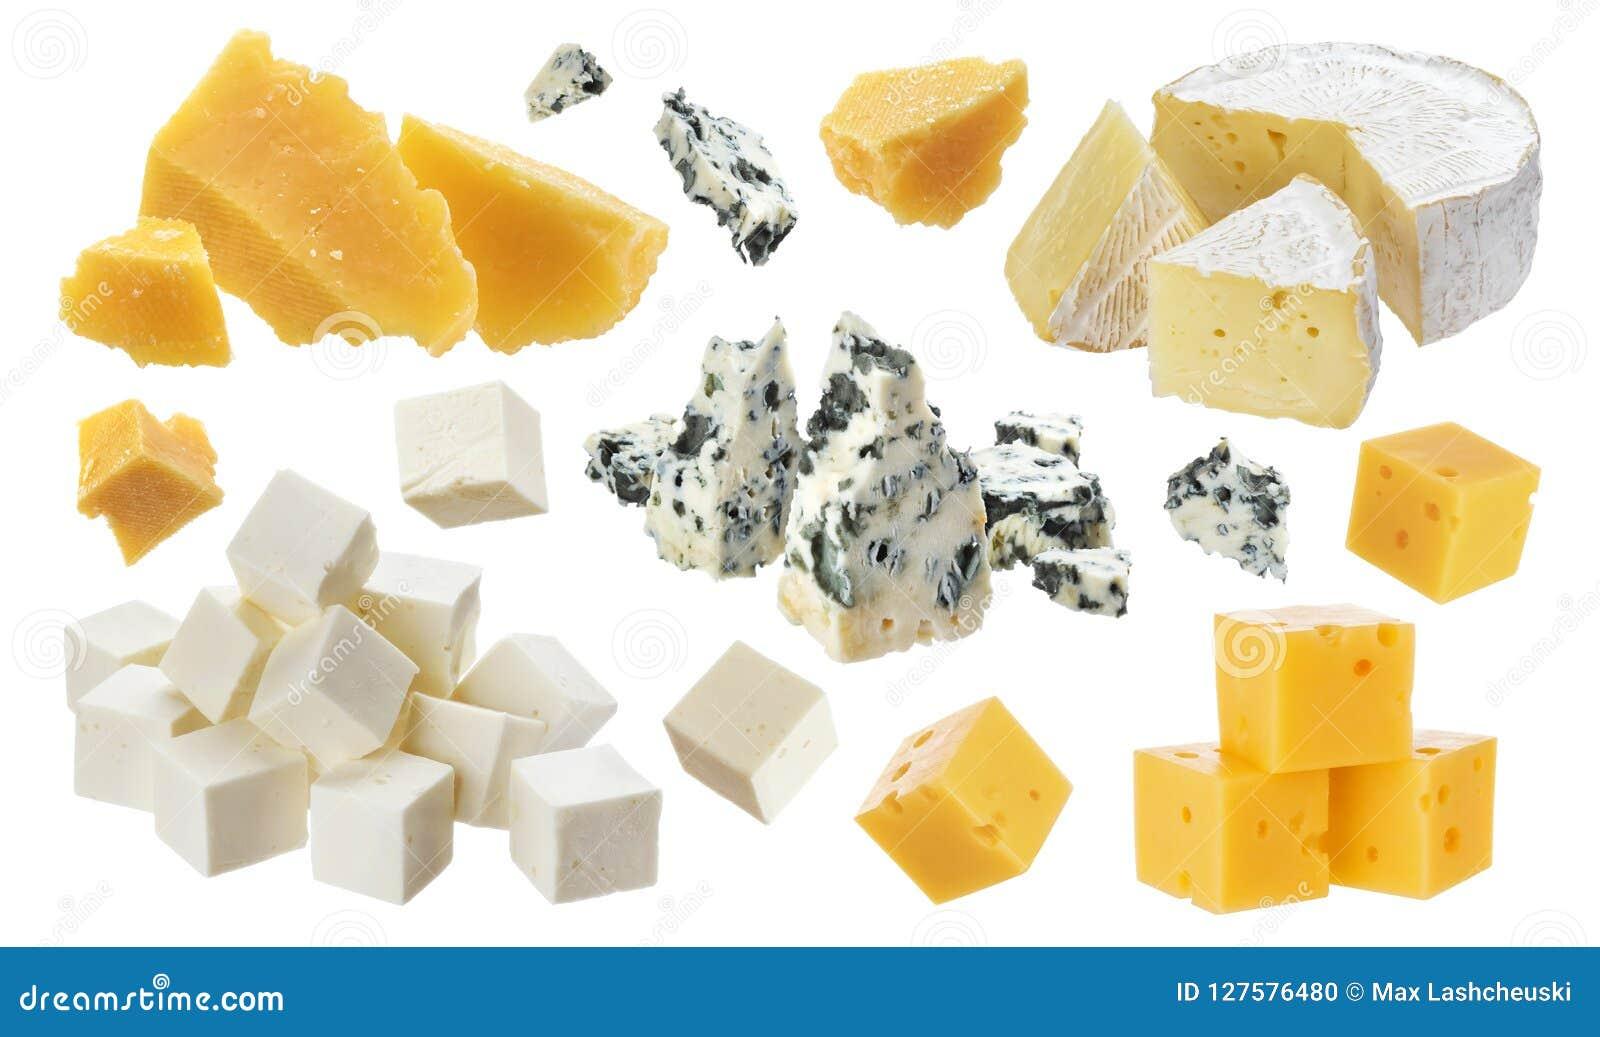 Verschillende stukken van kaas Cheddar, parmezaanse kaas, emmentaler, blukaas, camembert, feta op witte achtergrond wordt geïsole